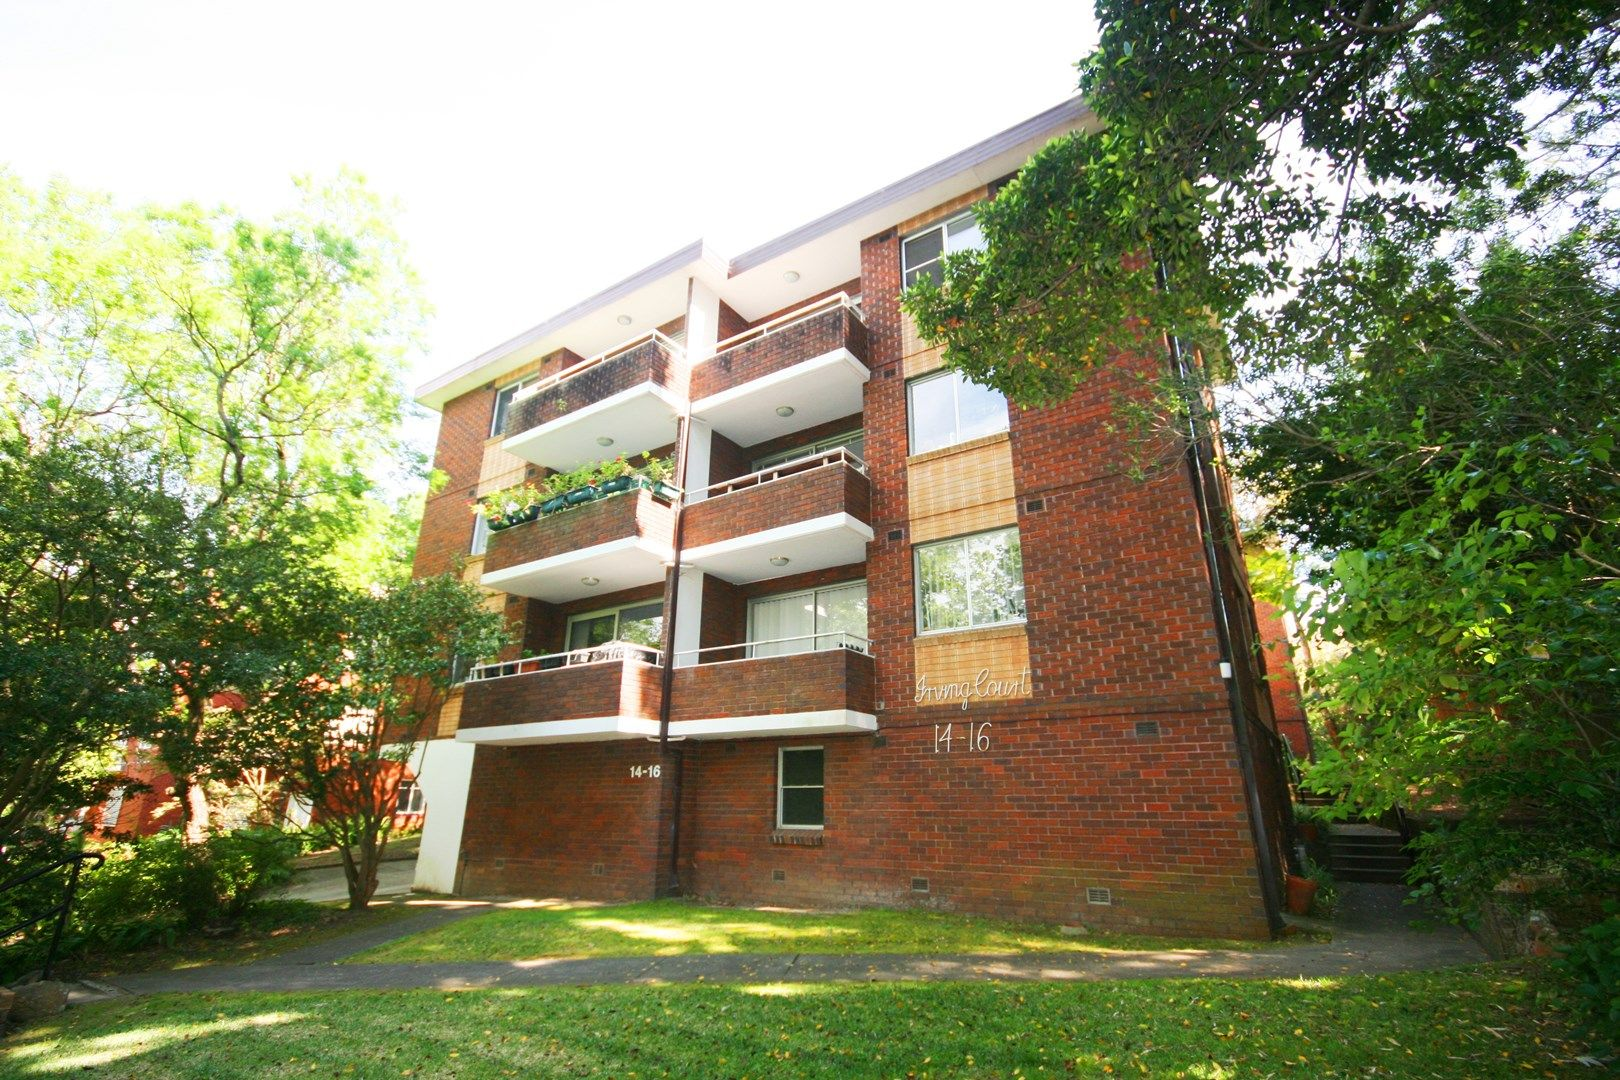 6/14-16 Hazelbank Road, Wollstonecraft NSW 2065, Image 0